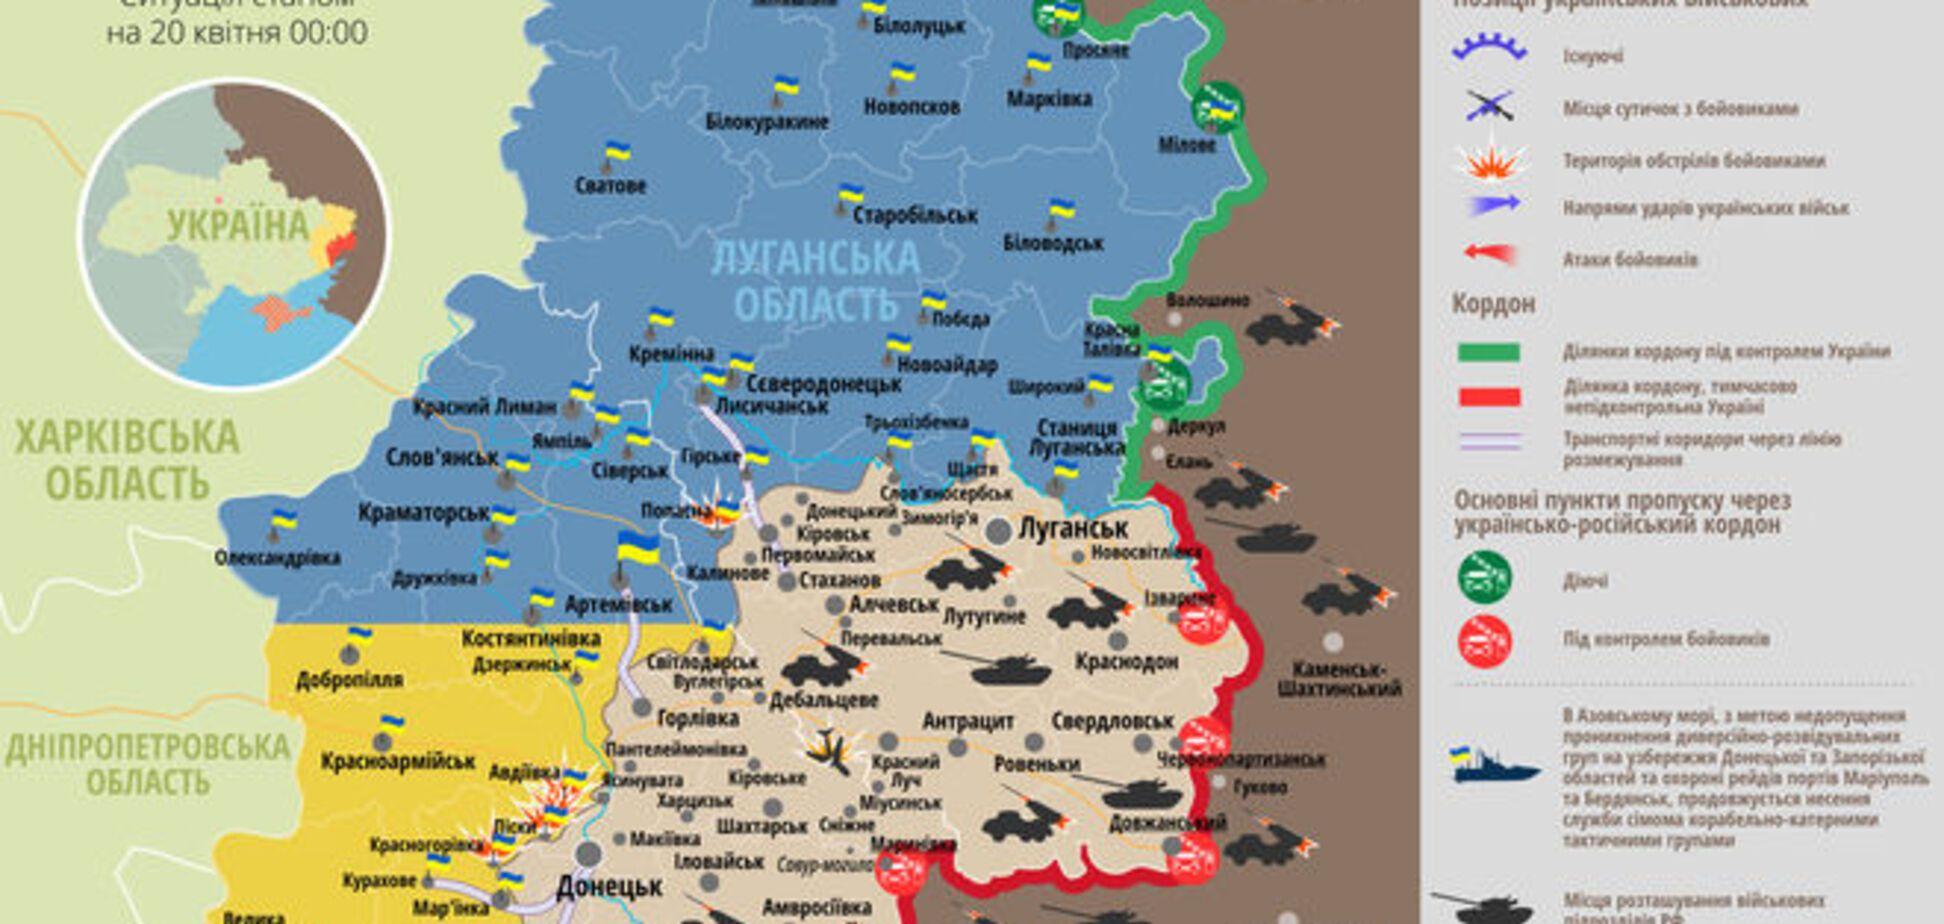 З'явилася нова мапа зони АТО